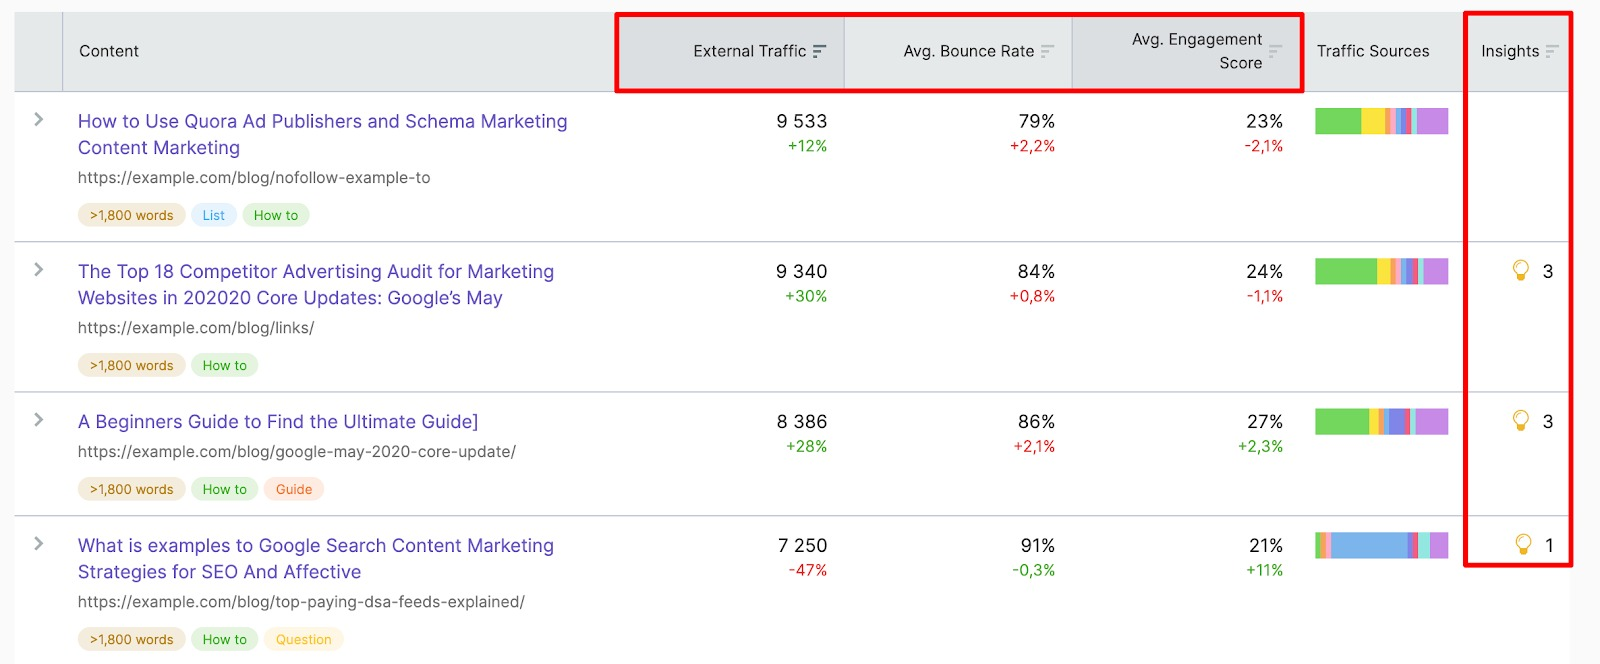 Top performing content metrics